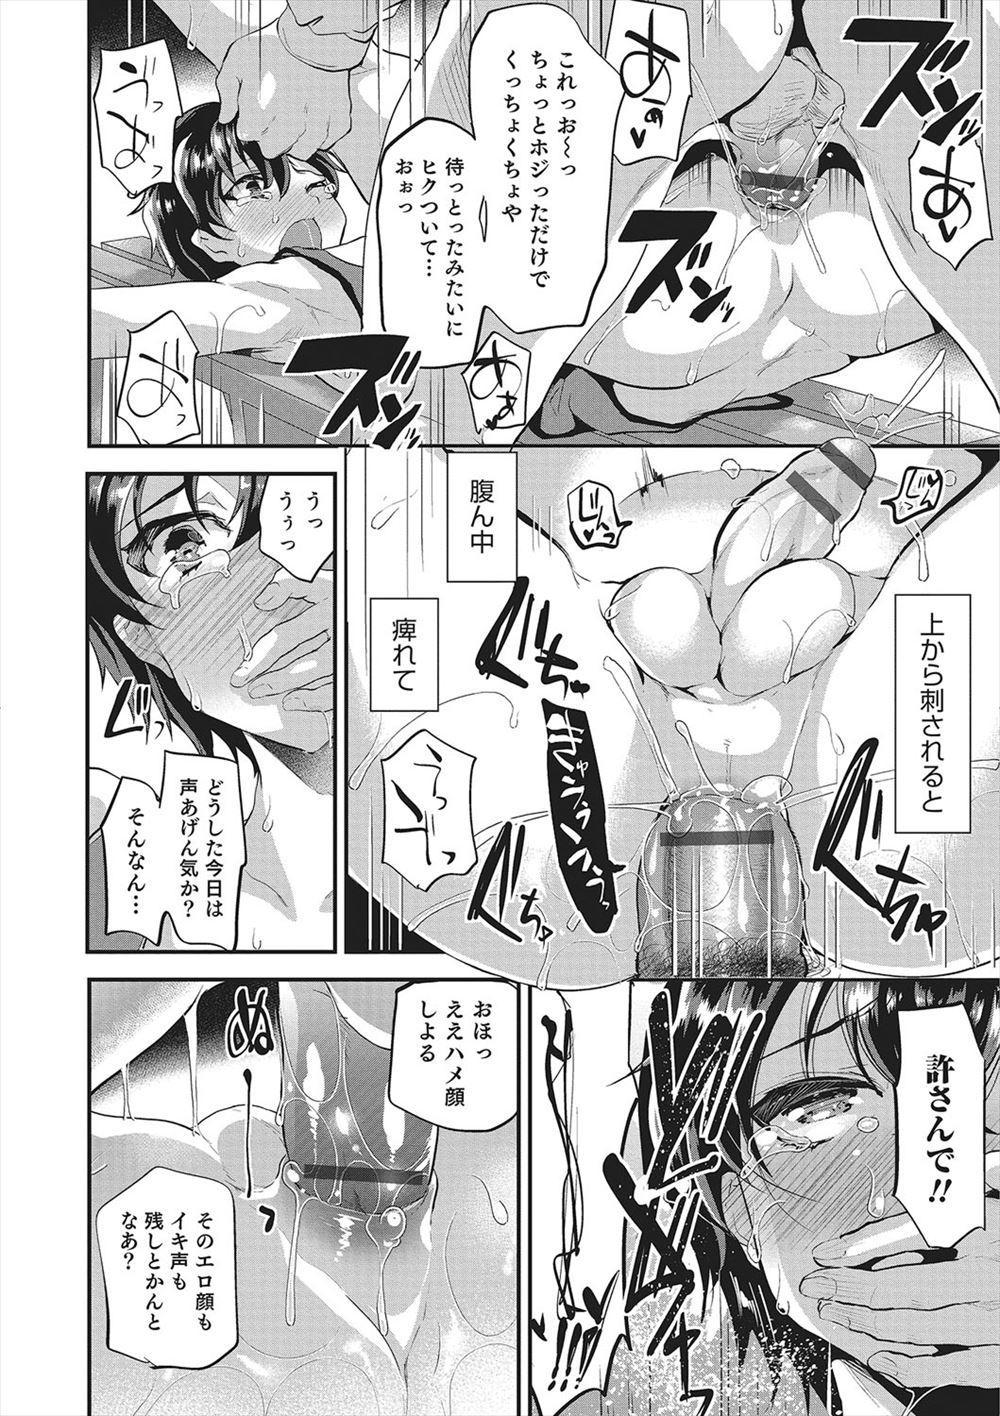 Shounen Ryoujoku File 18